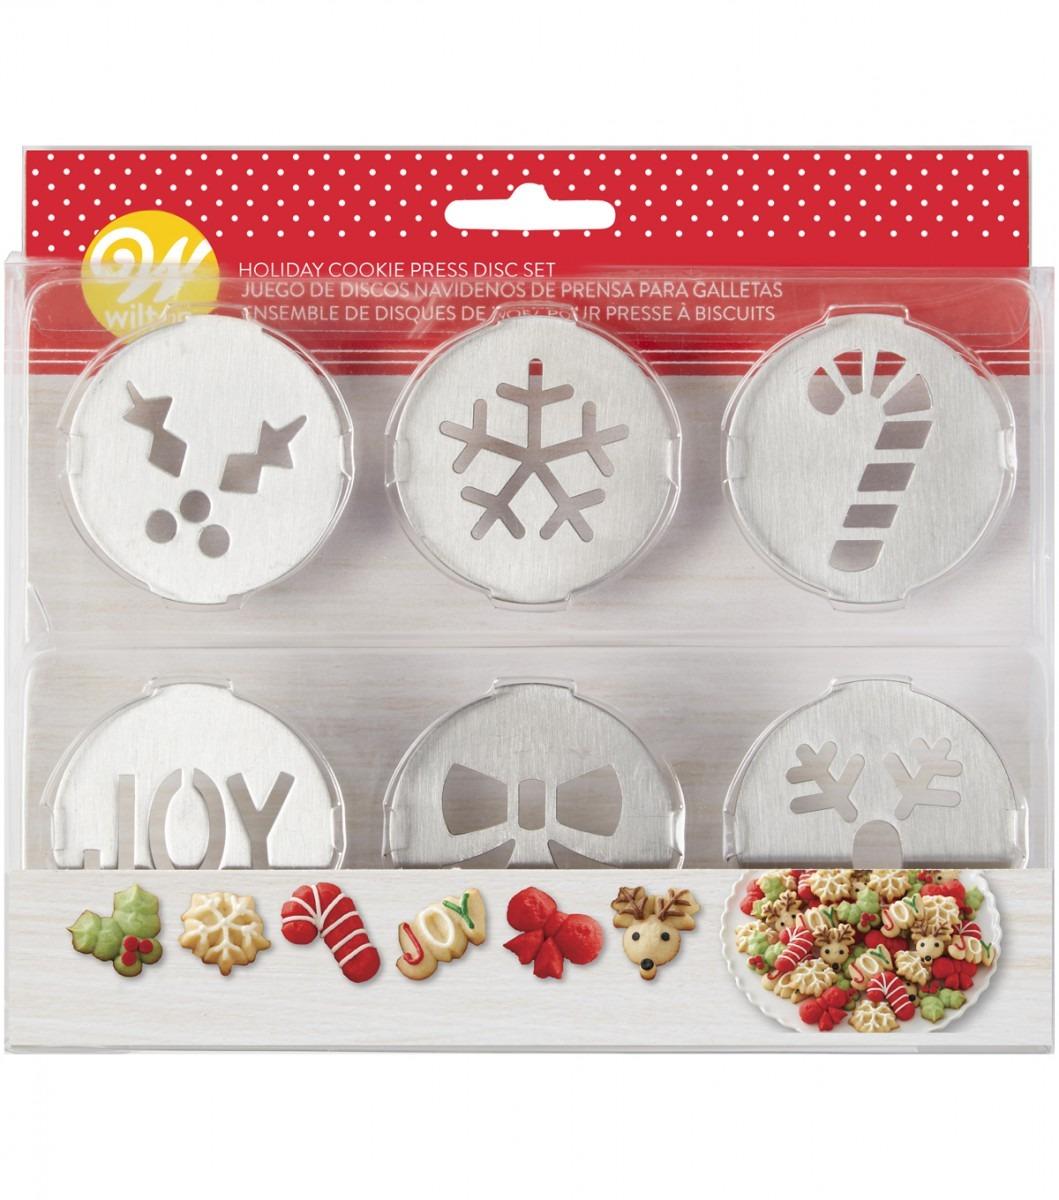 Wilton Holiday Cookie Press Disc Set